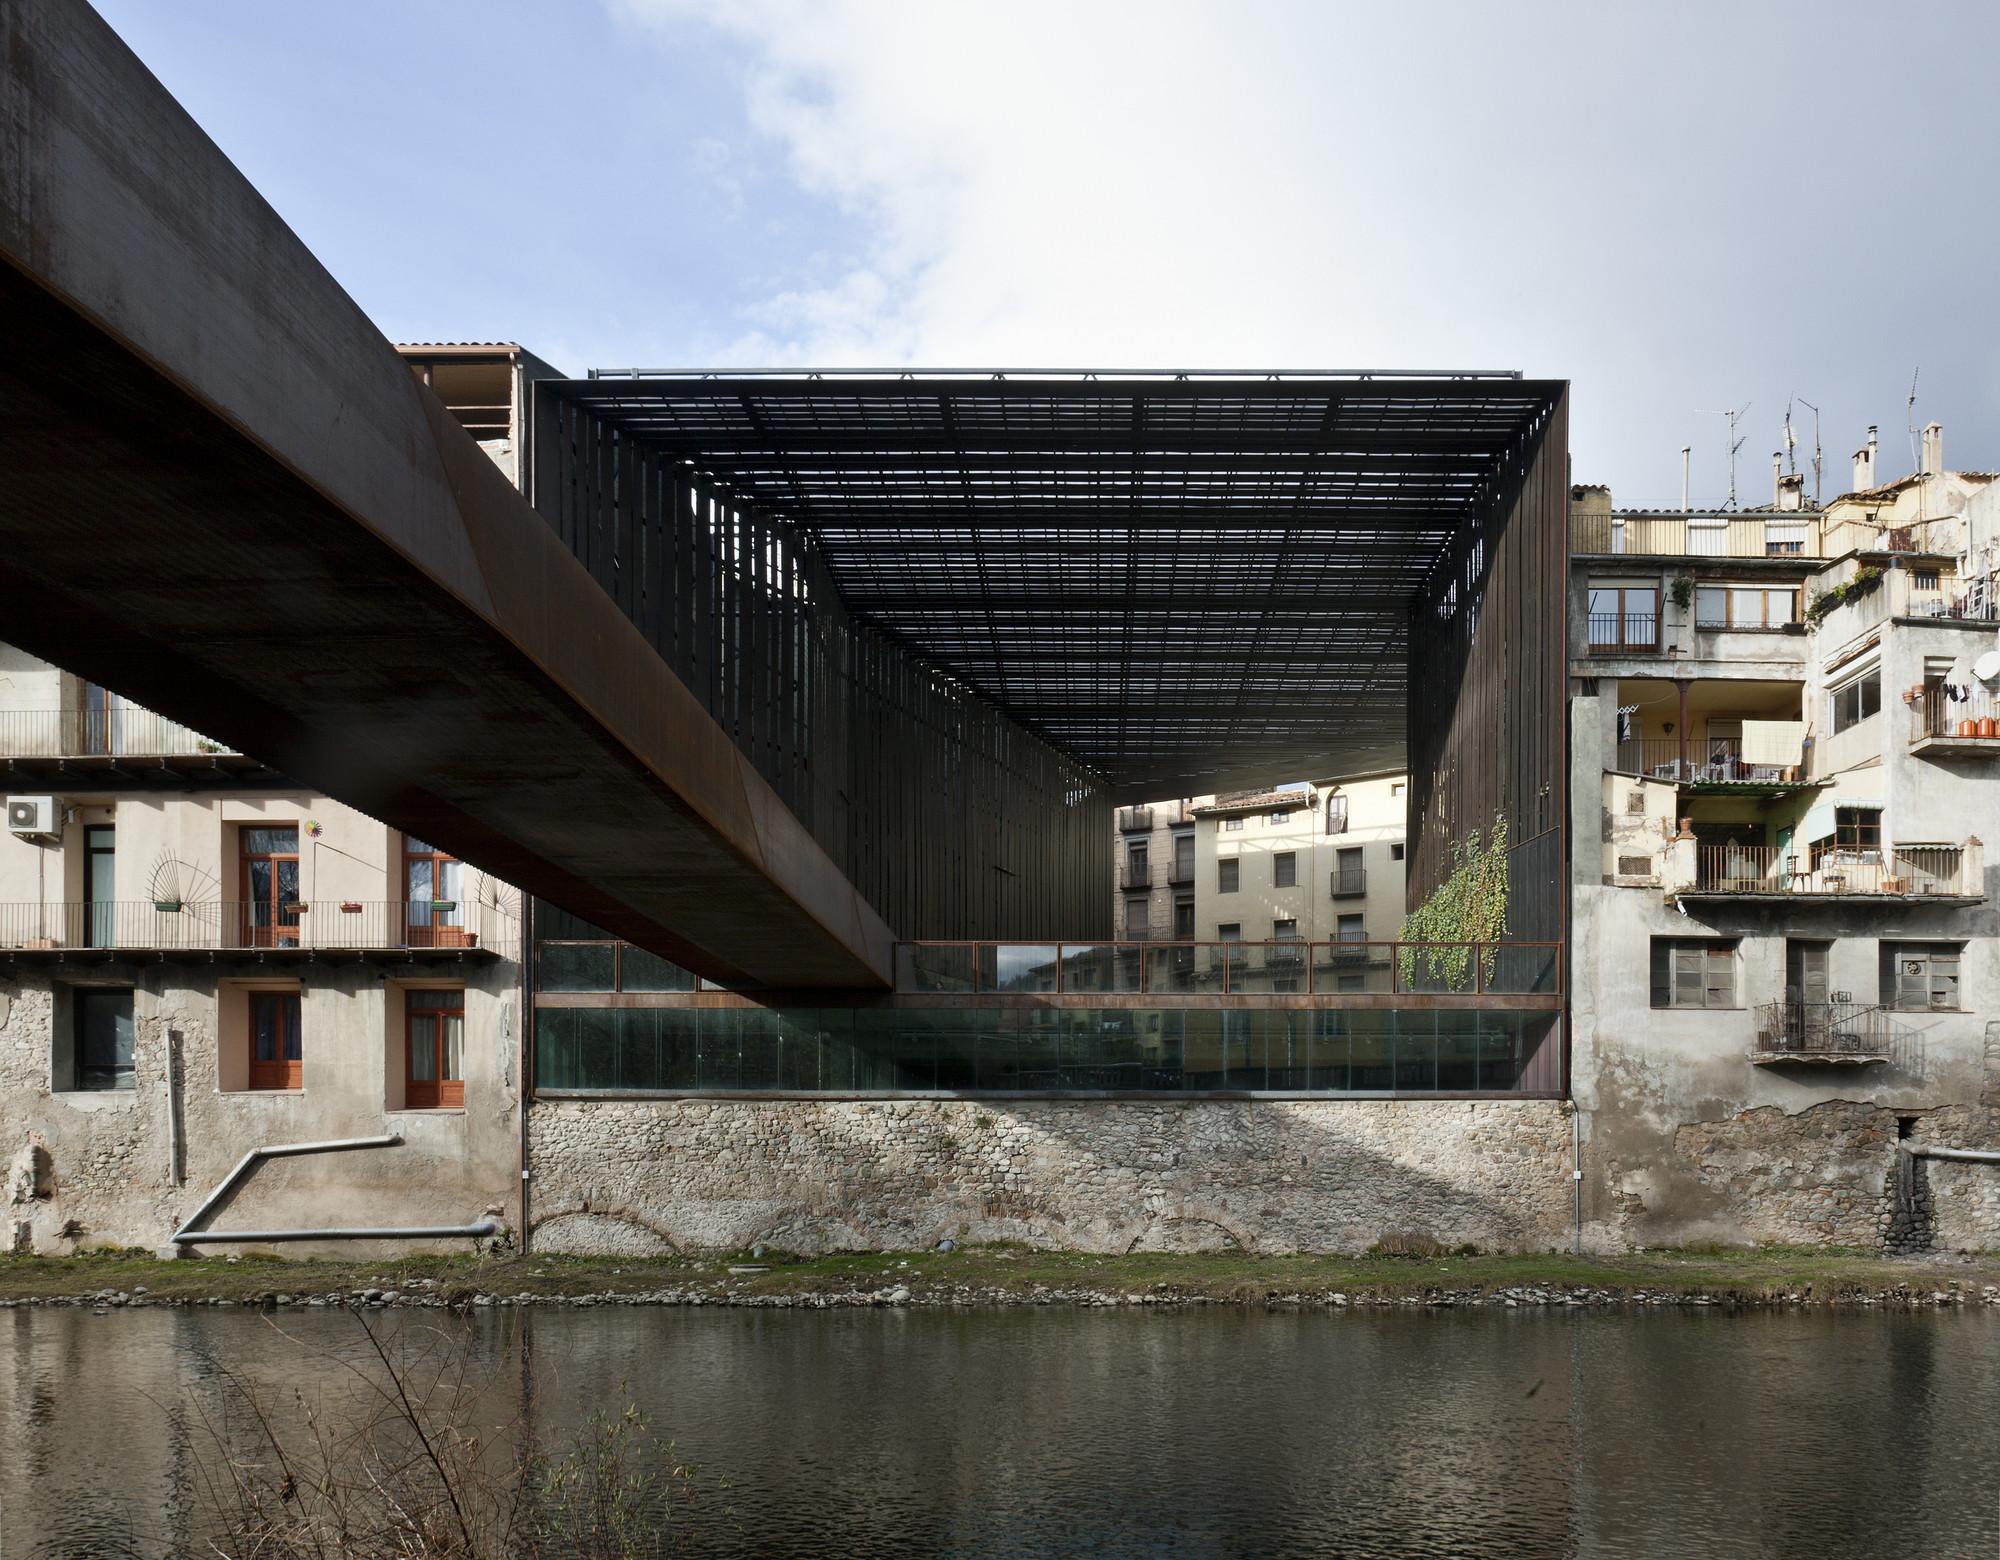 Cortesía de RCR Arquitectes + PUIGCORBÉ arquitectes